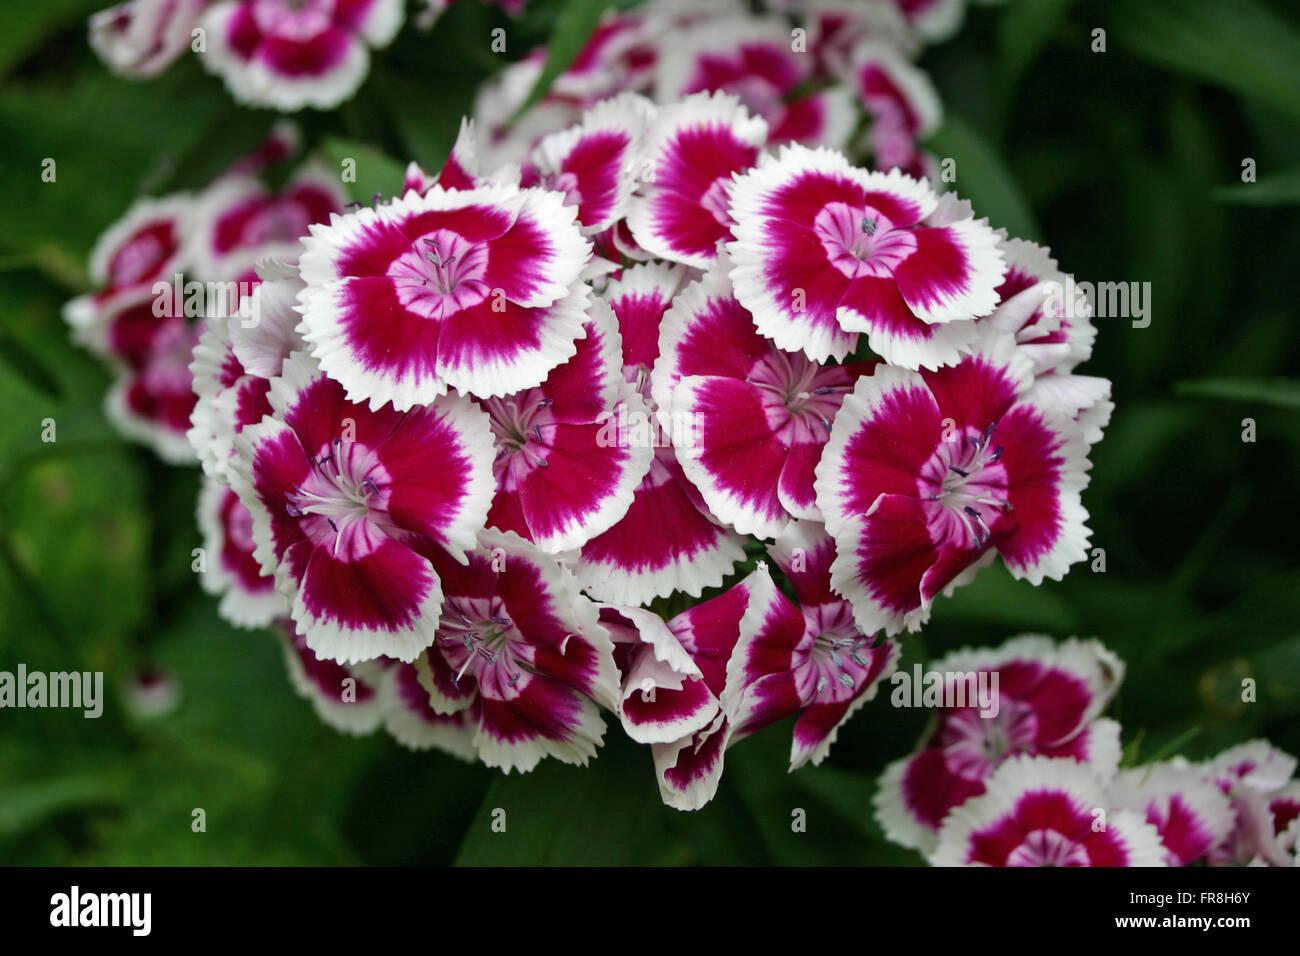 Cluster of pink sweet william dianthus barbatus flowers with white cluster of pink sweet william dianthus barbatus flowers with white edges to the petals background of dark foliage mightylinksfo